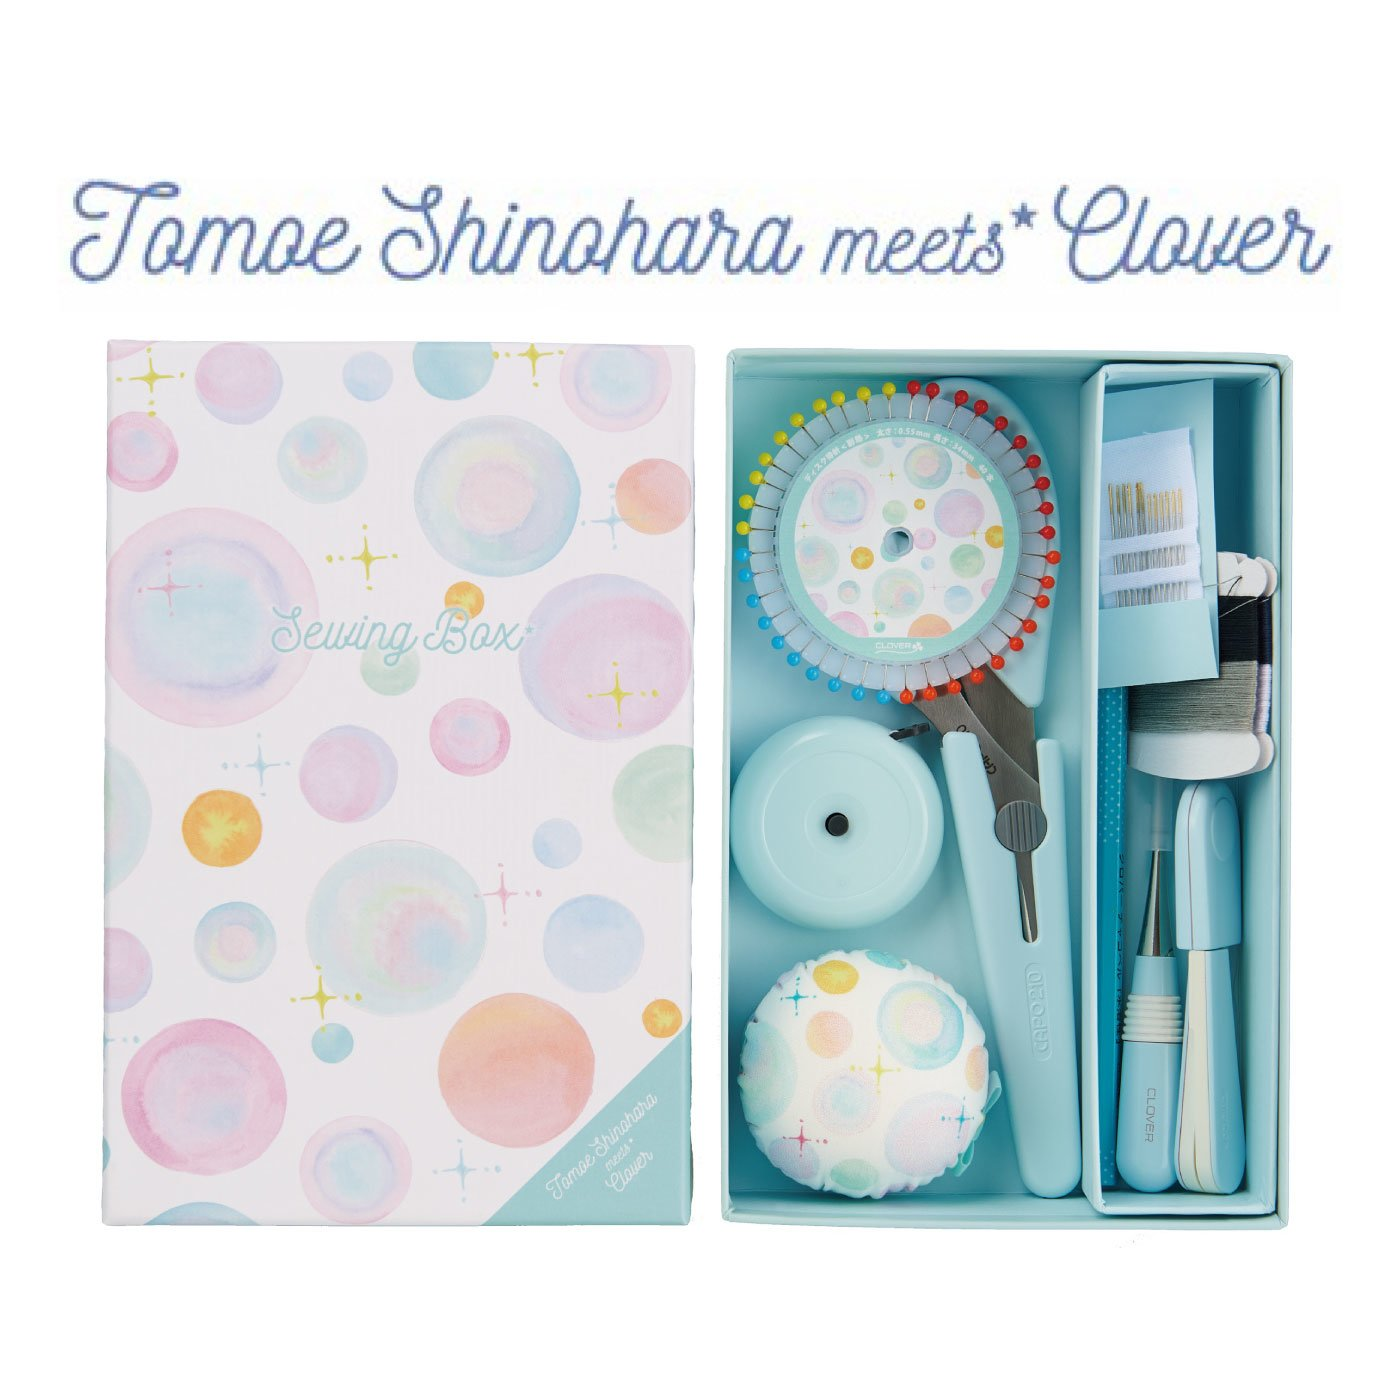 Cloverクロバー ◆限定品◆ソーイングボックス 「篠原ともえデザイン」